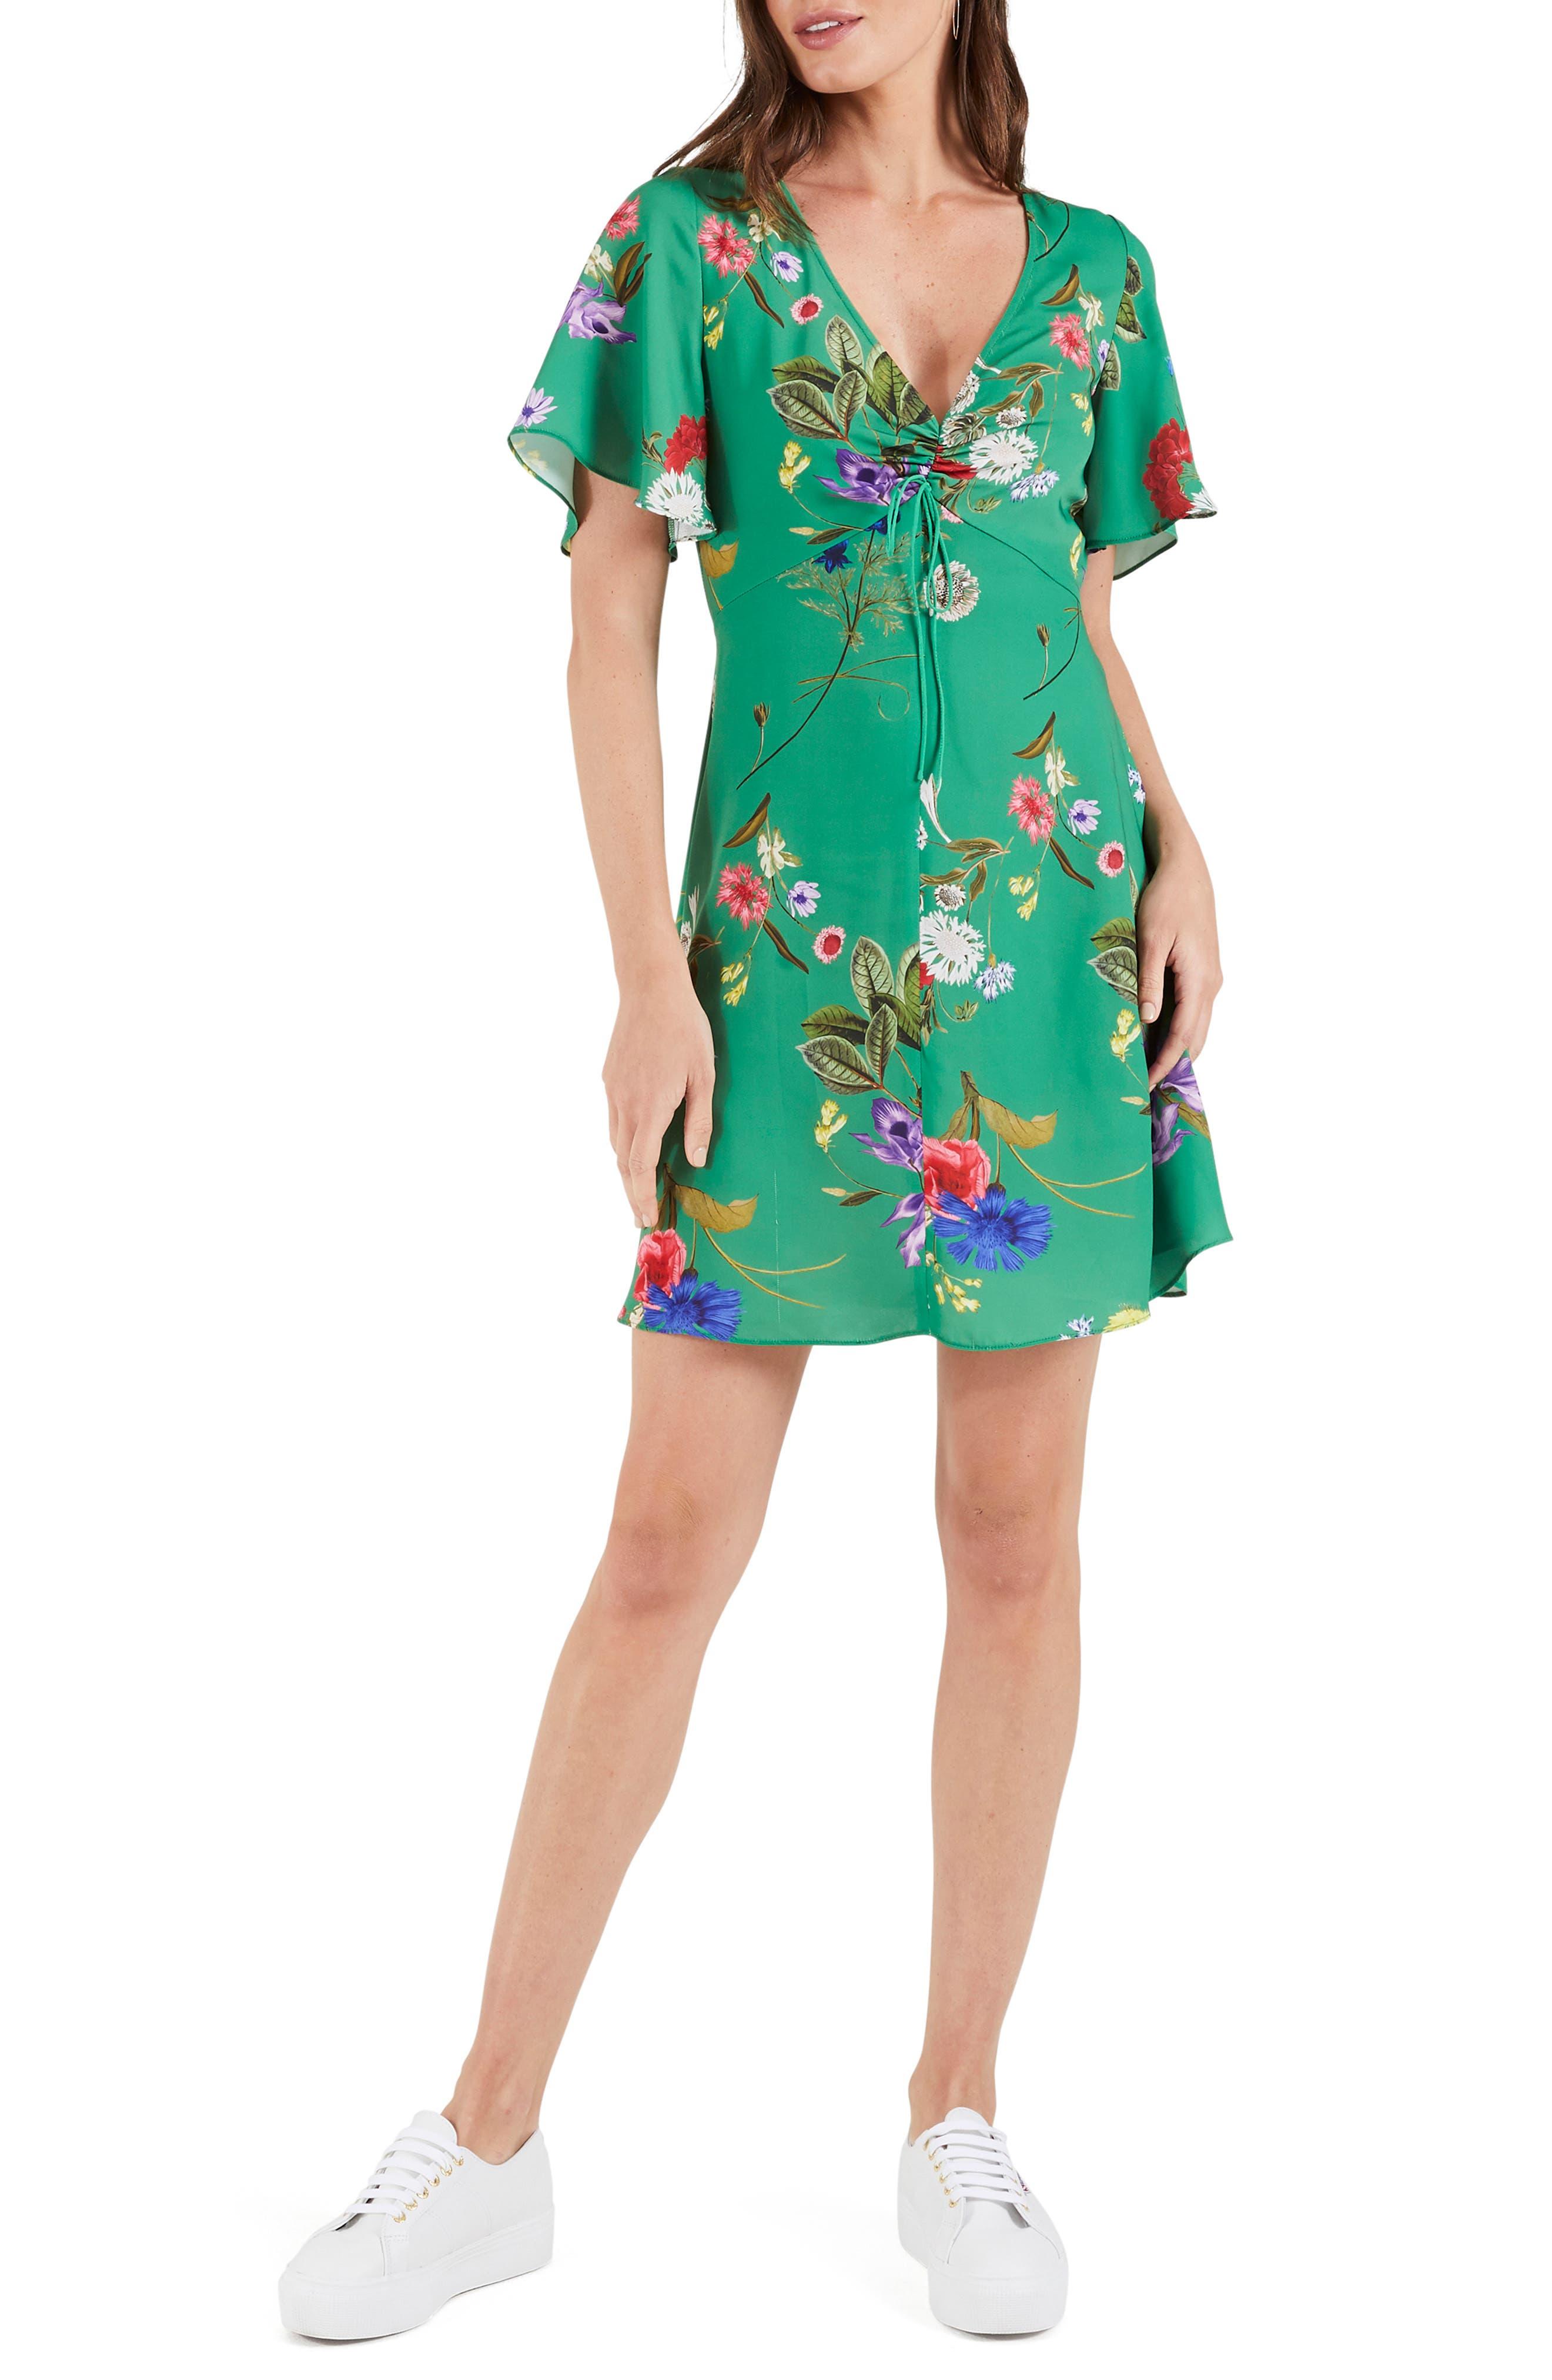 24899b7da0a758 Women's Cooper St Clothing | Nordstrom